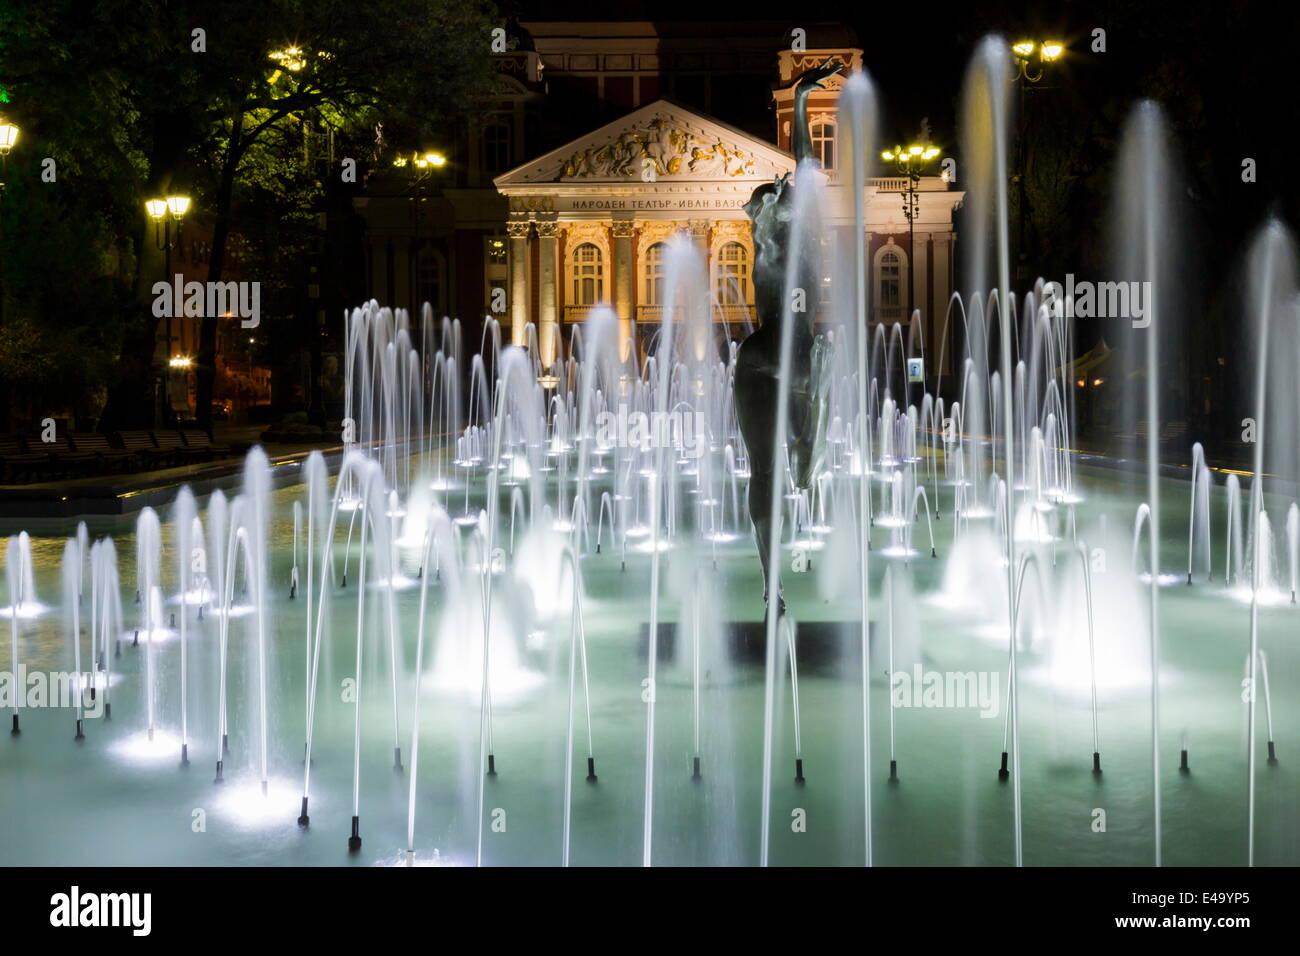 Ivan Vasov, National Theatre, City Garden Park, Sofia, Bulgaria, Europe Stock Photo